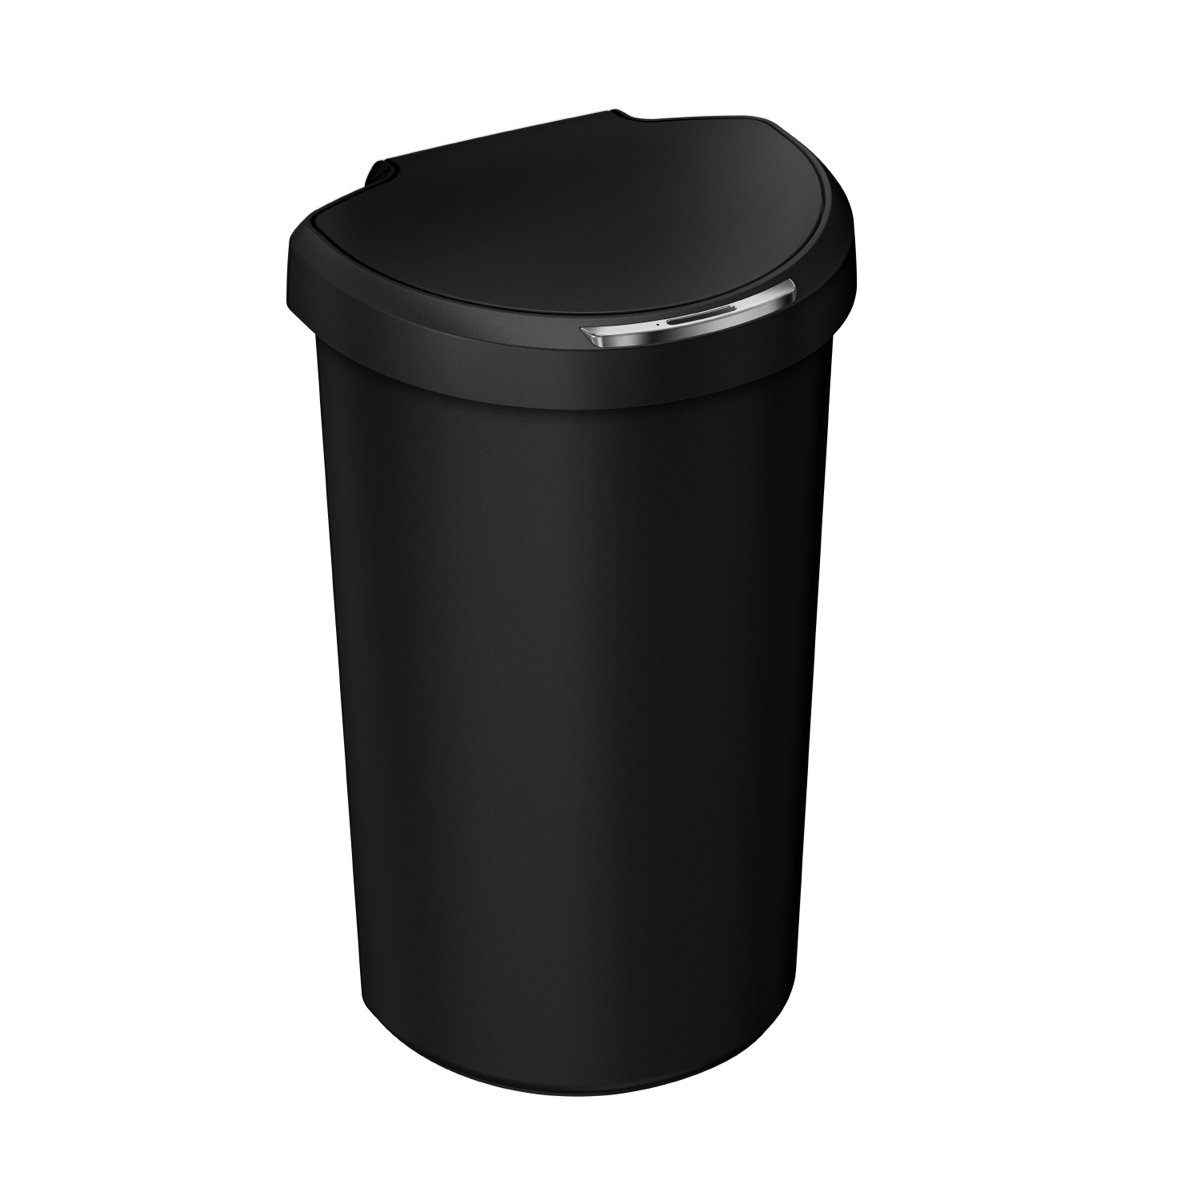 Simplehuman Semi Round Prullenbak - Sensor - Kunststof - 40 l - Zwart kopen